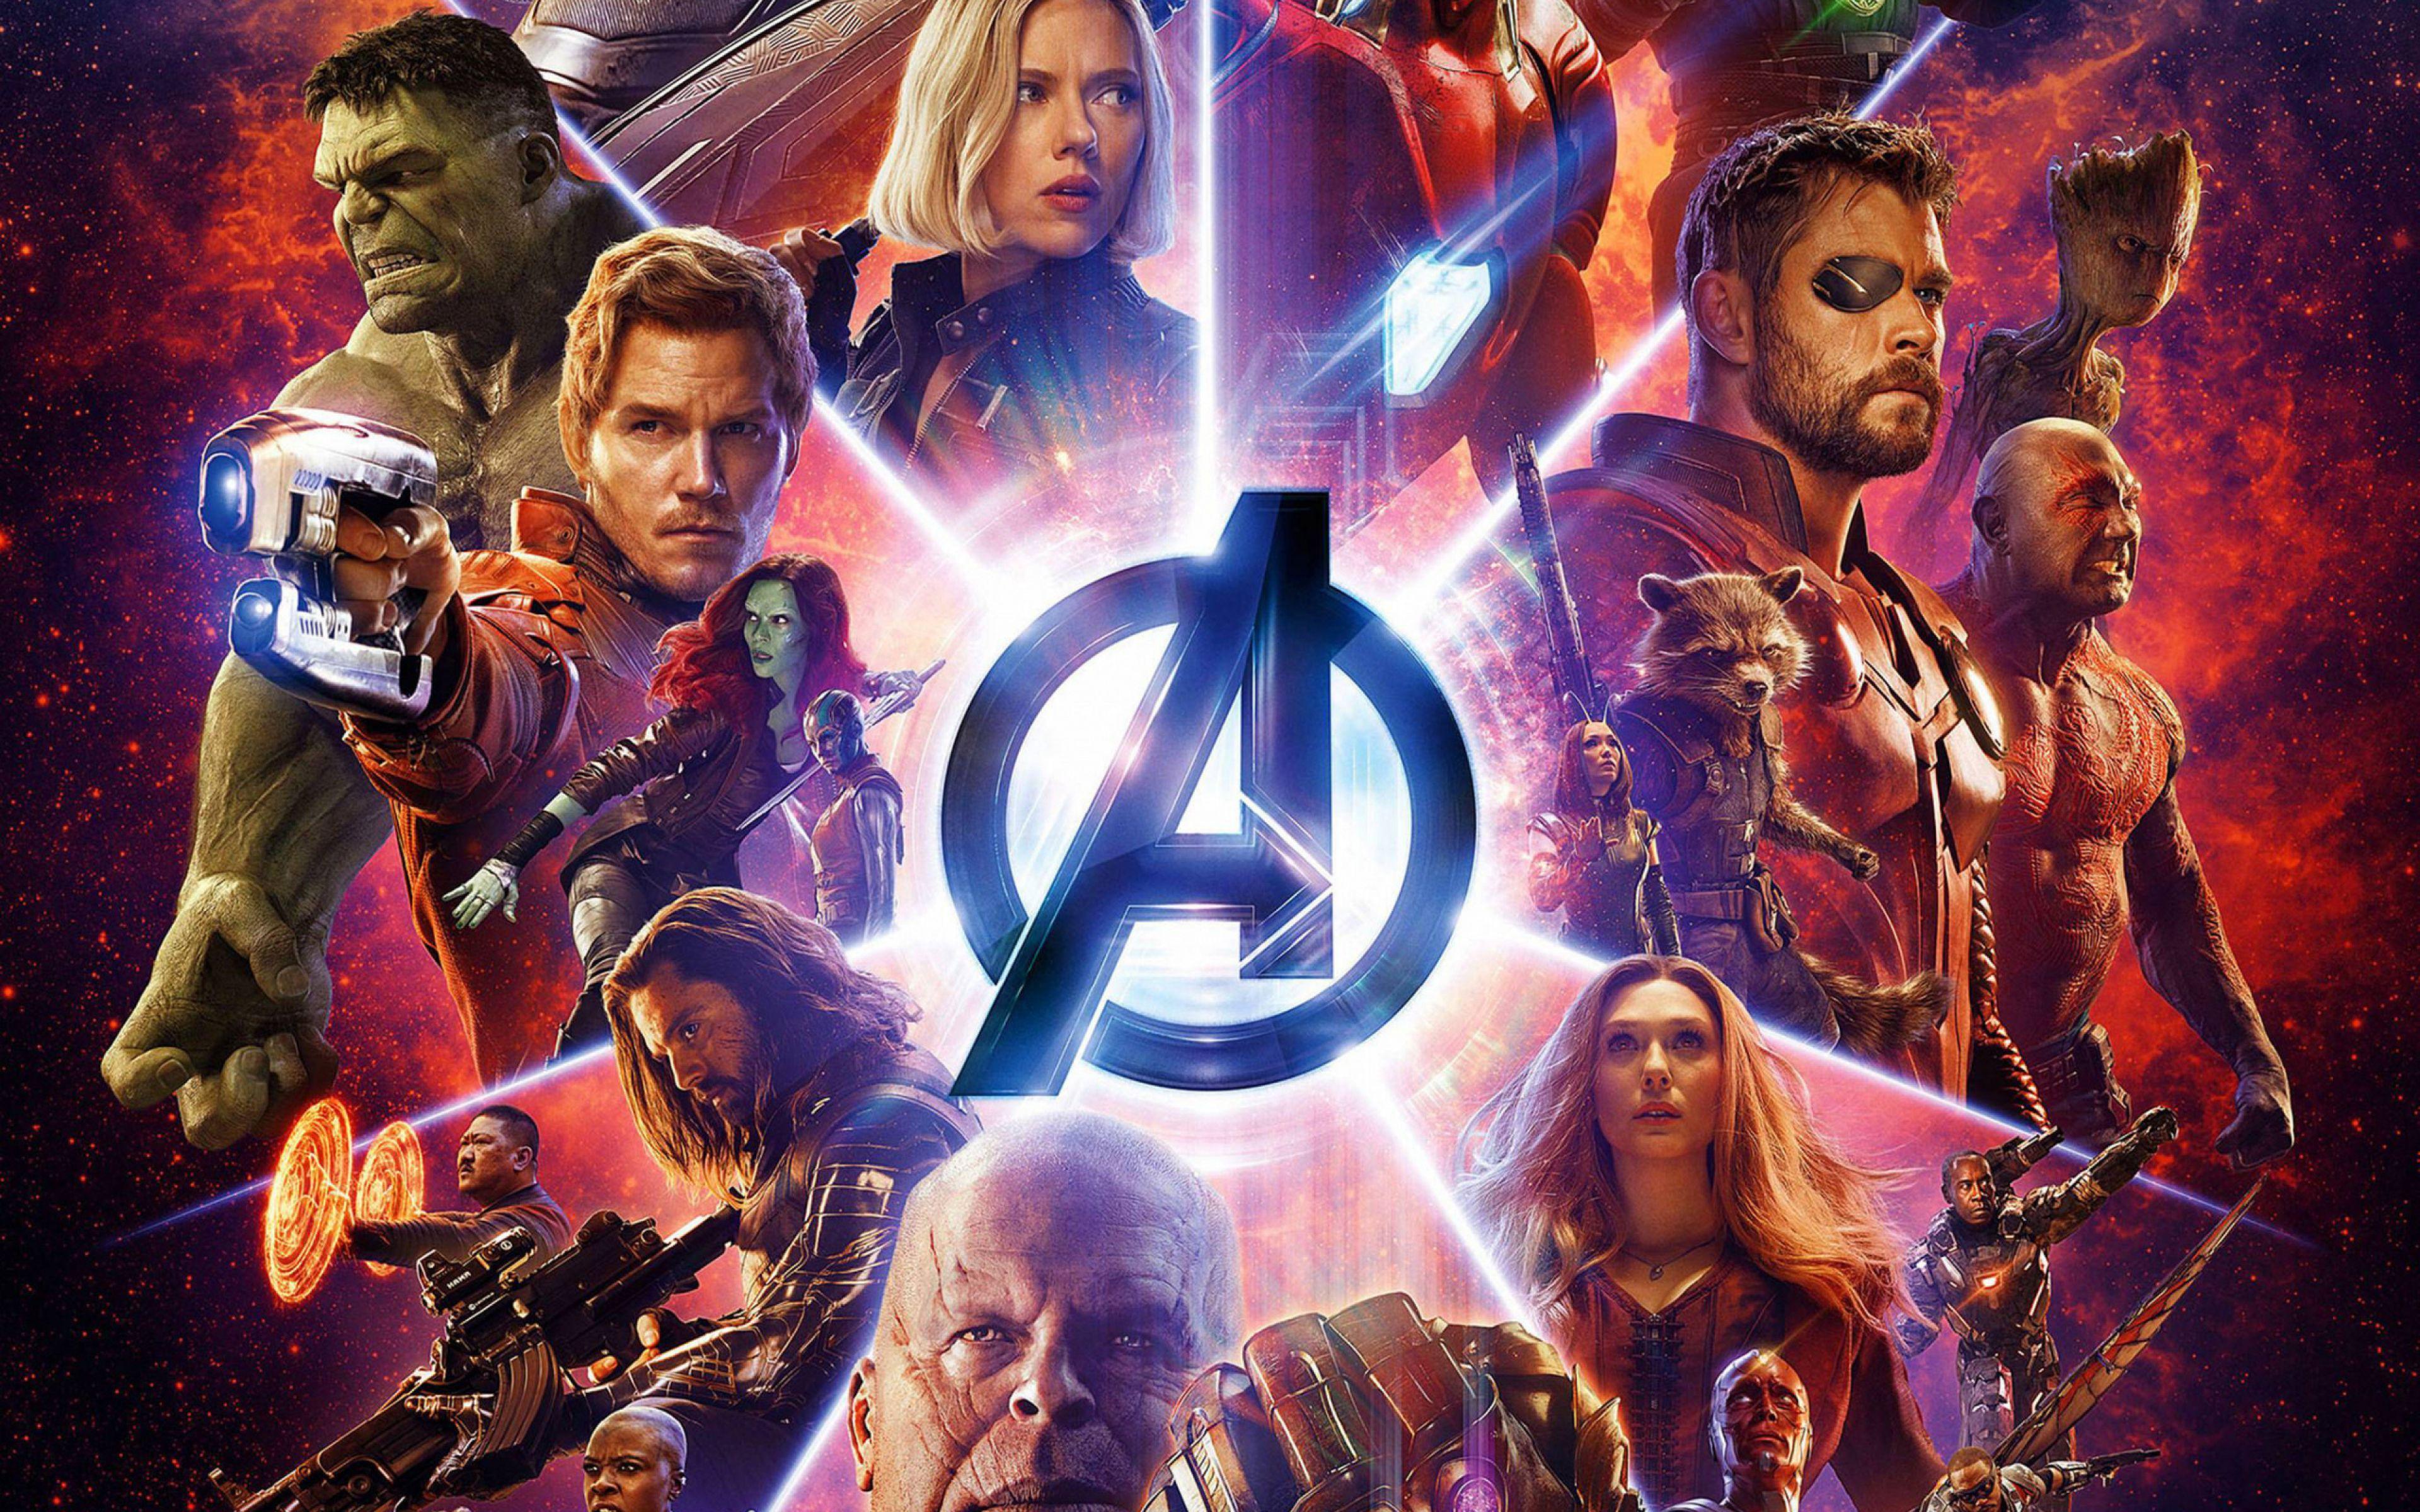 Ultra Hd Avengers Wallpapers Top Free Ultra Hd Avengers Backgrounds Wallpaperaccess